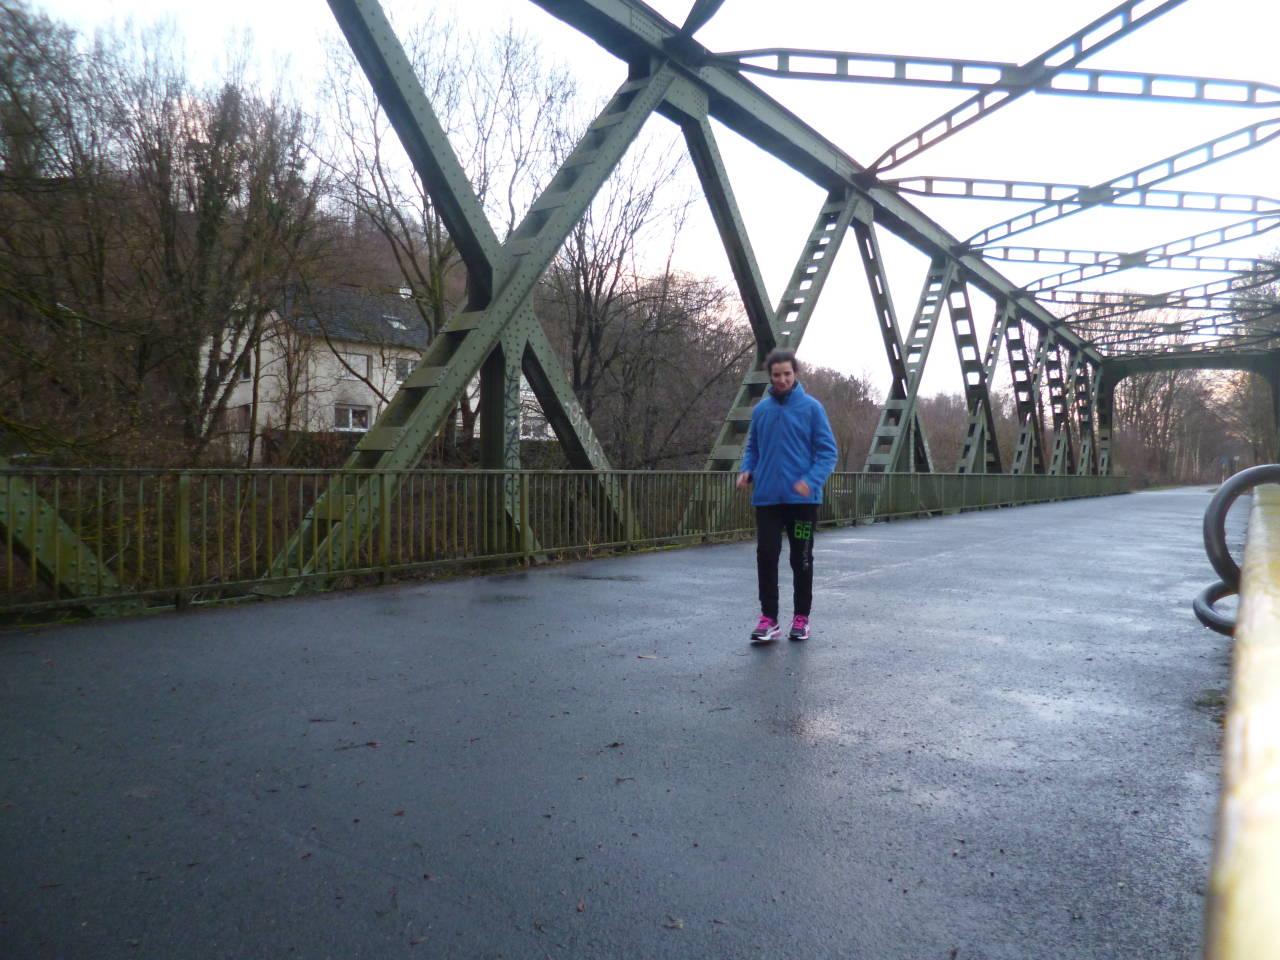 joggen morgens nüchtern